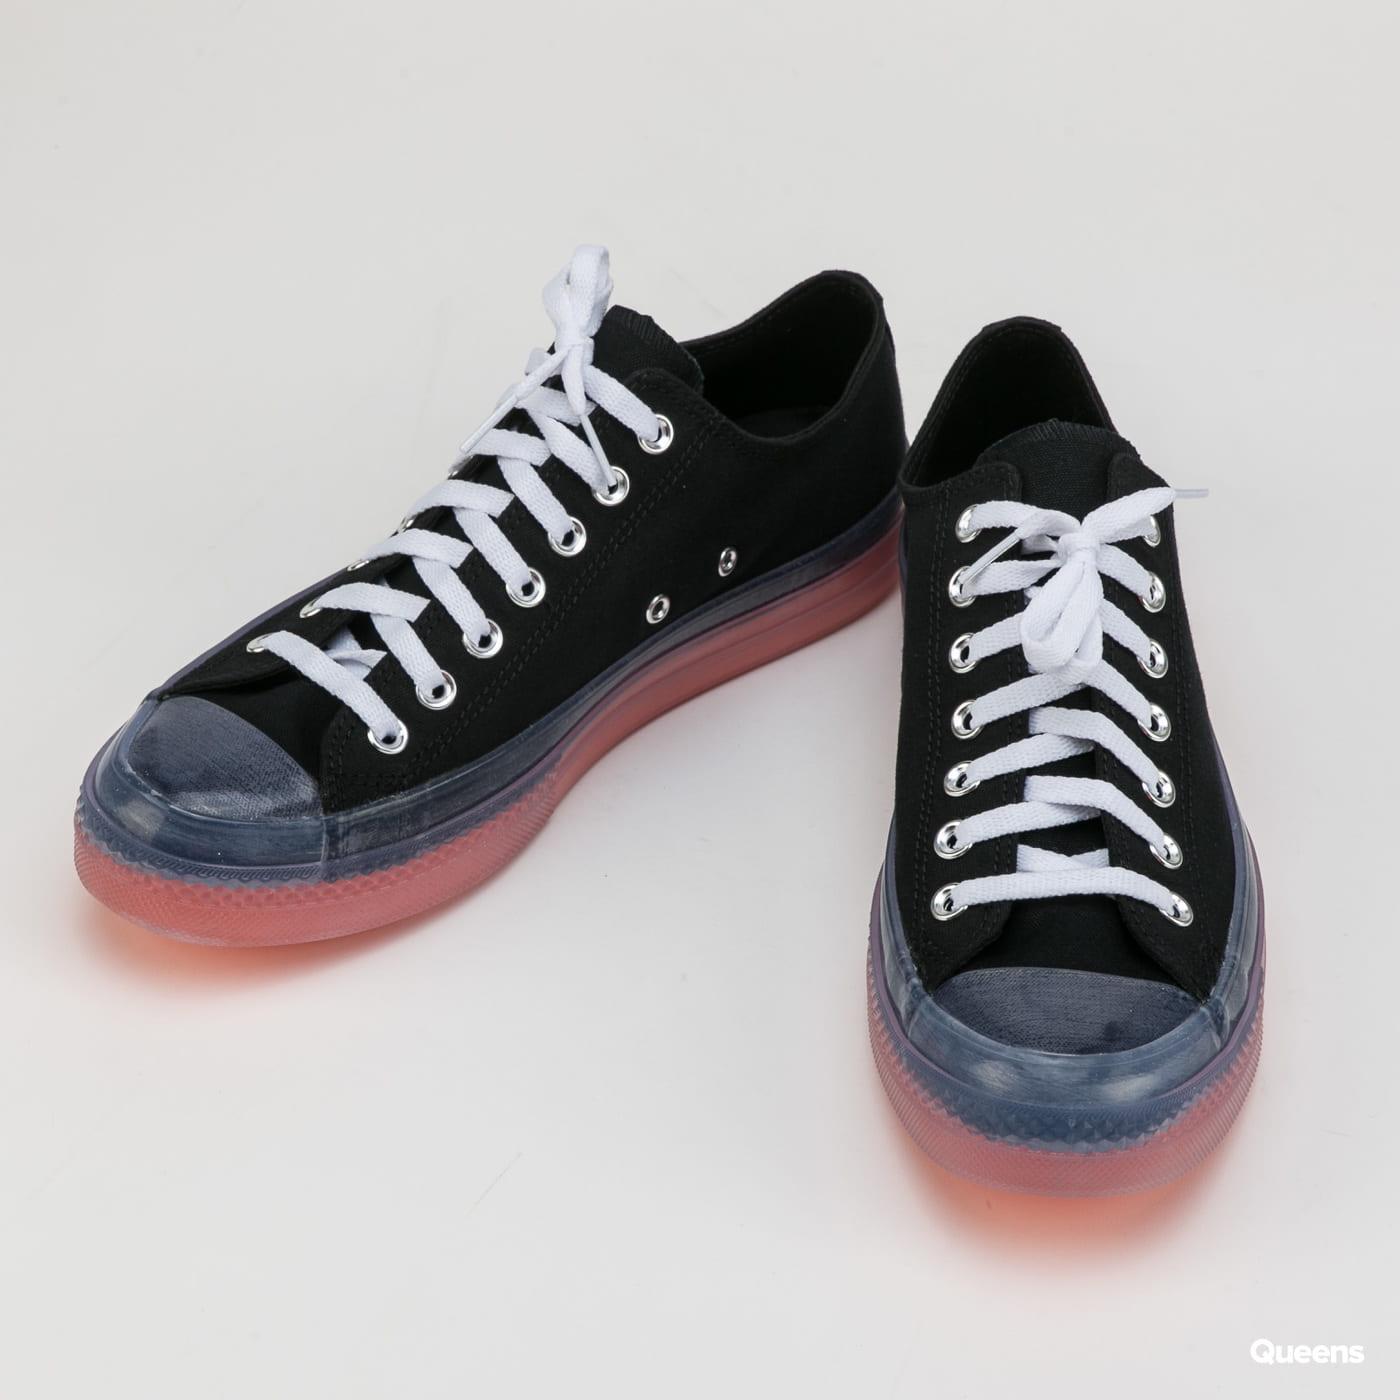 Converse Chuck Taylor All Star CX OX black / white / mild mango